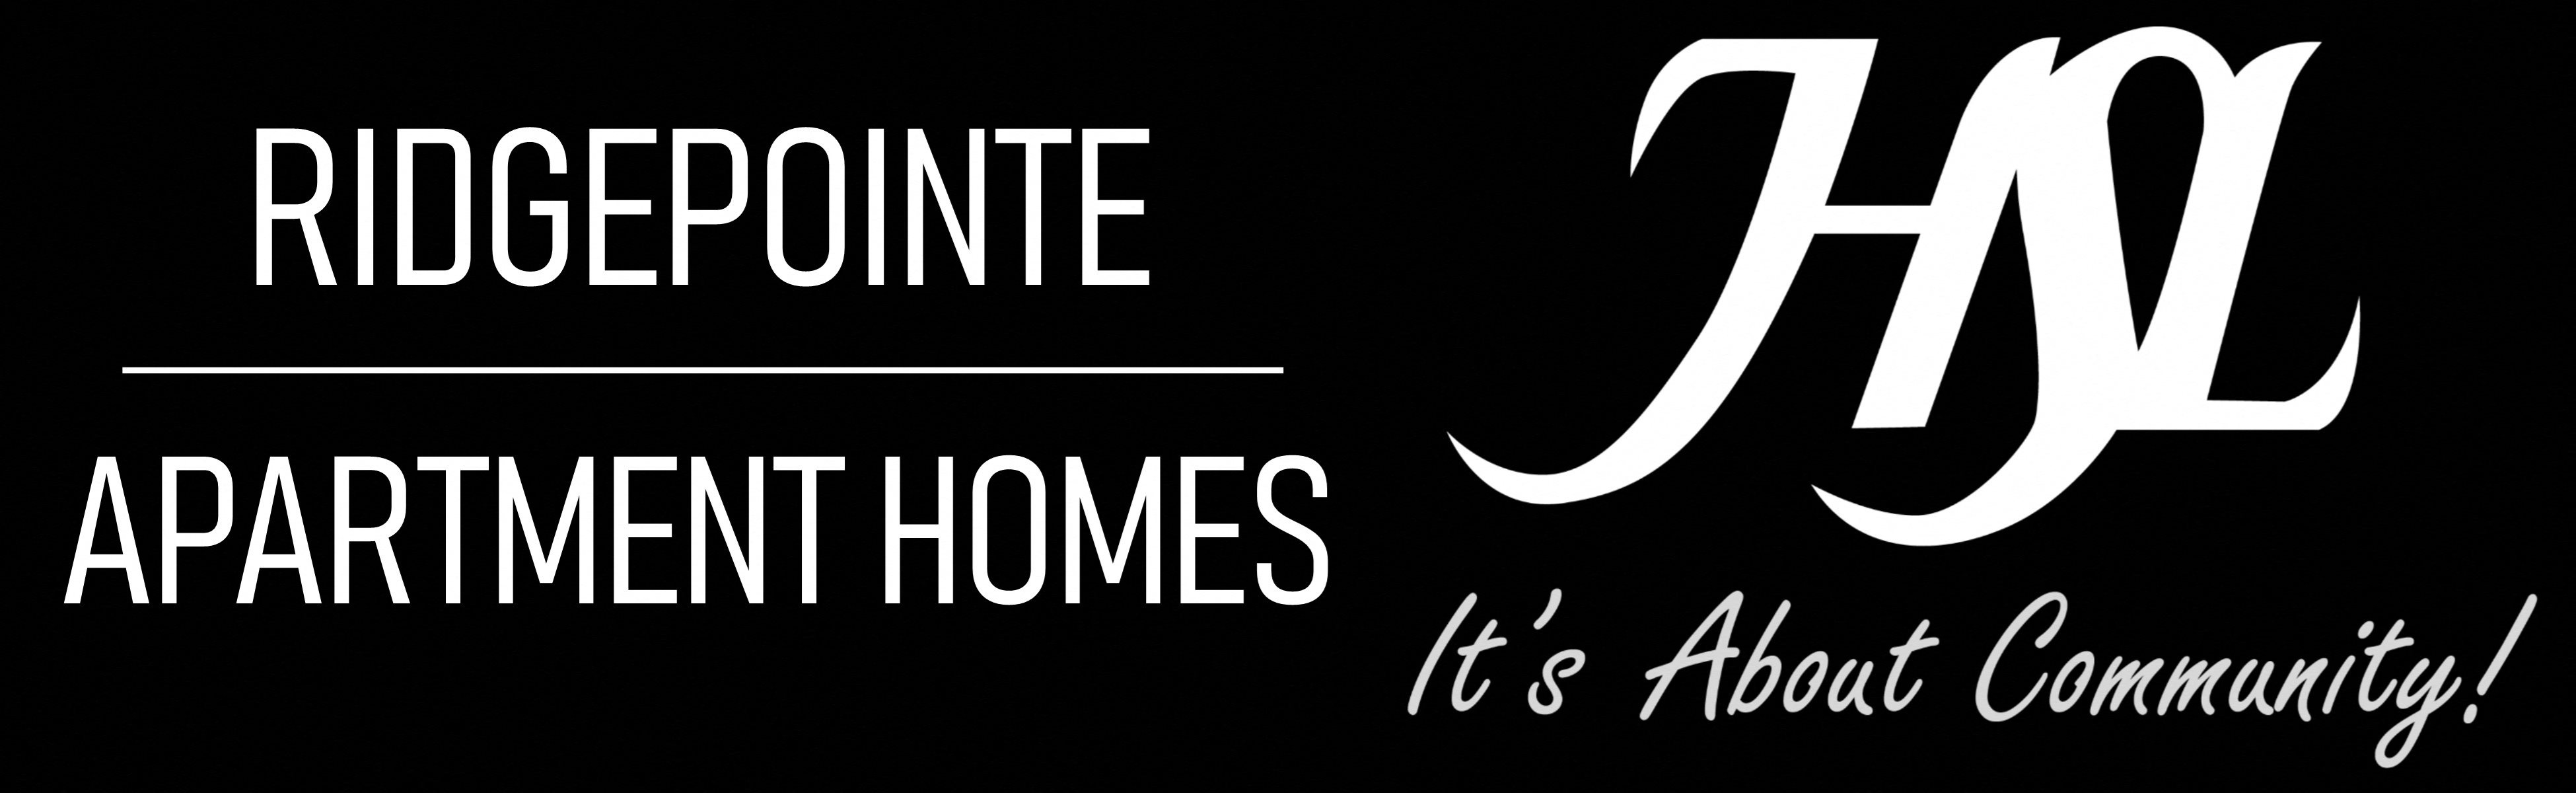 Ridgepointe Apartment Homes Logo